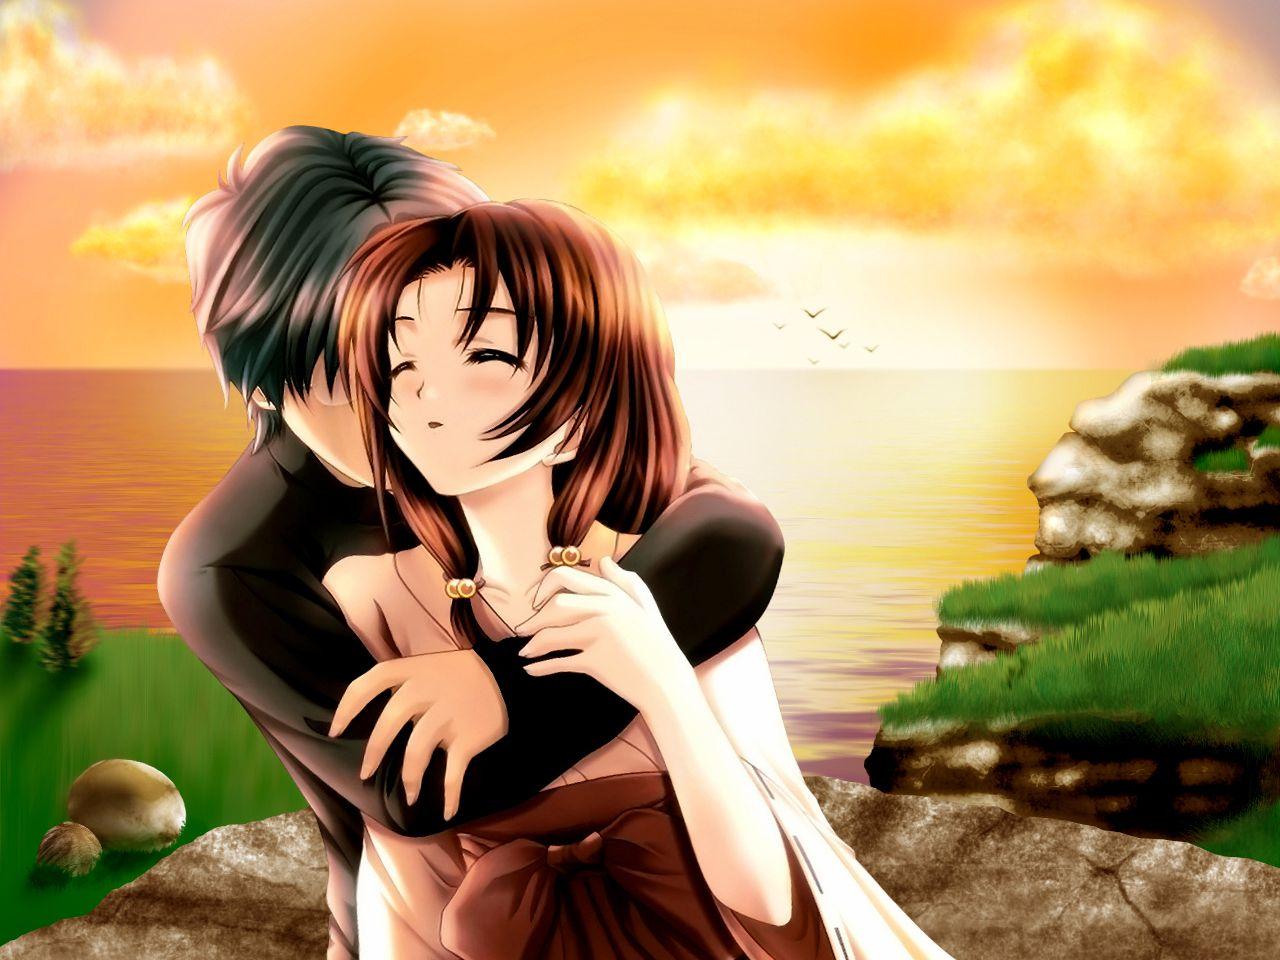 Anime Love Wallpaper Hd 3d gambar ke 14